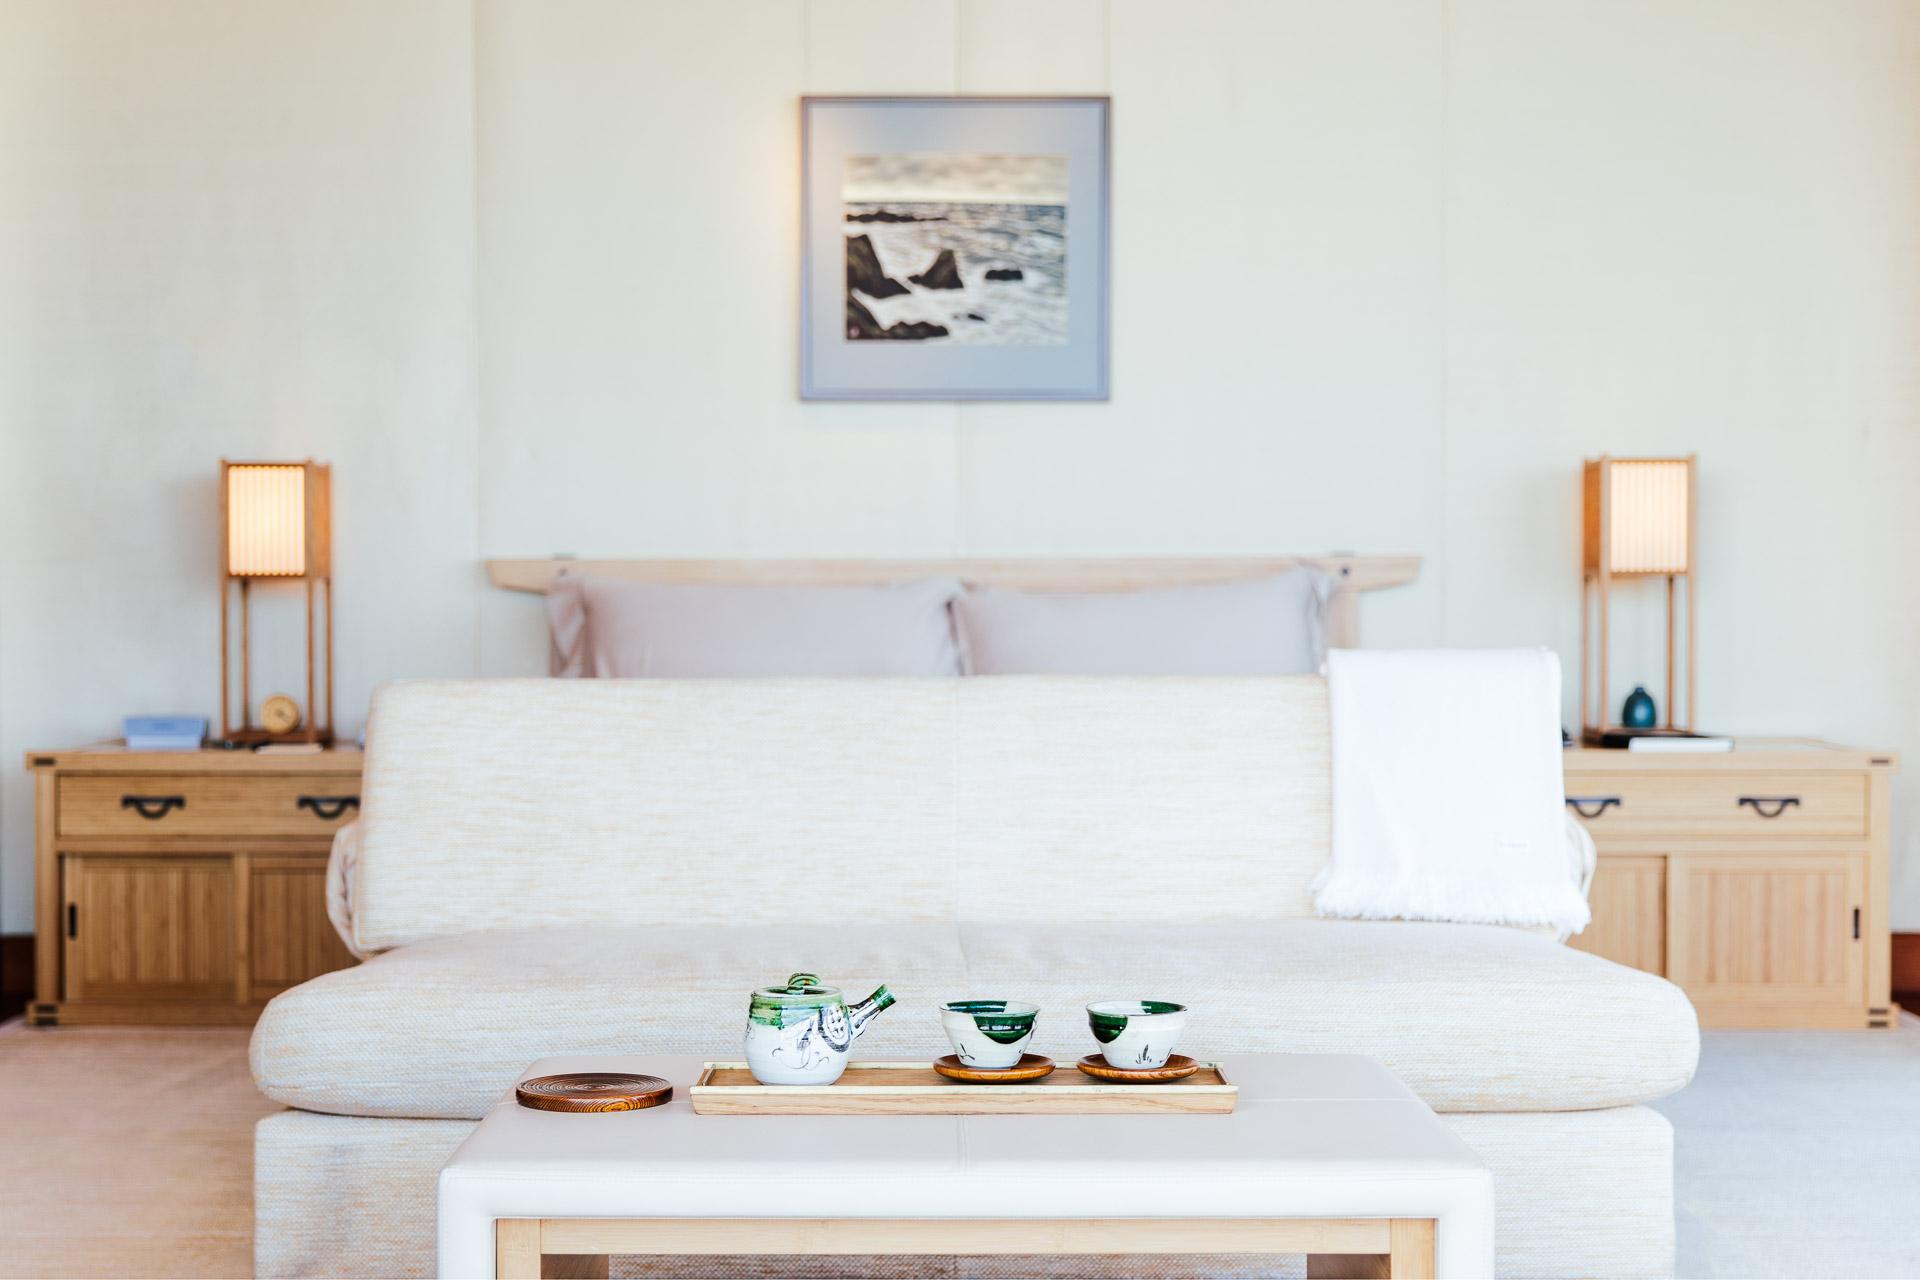 nobu-ryokan-malibu-california-luxury-hotel-photographer-los-angeles-4.jpg